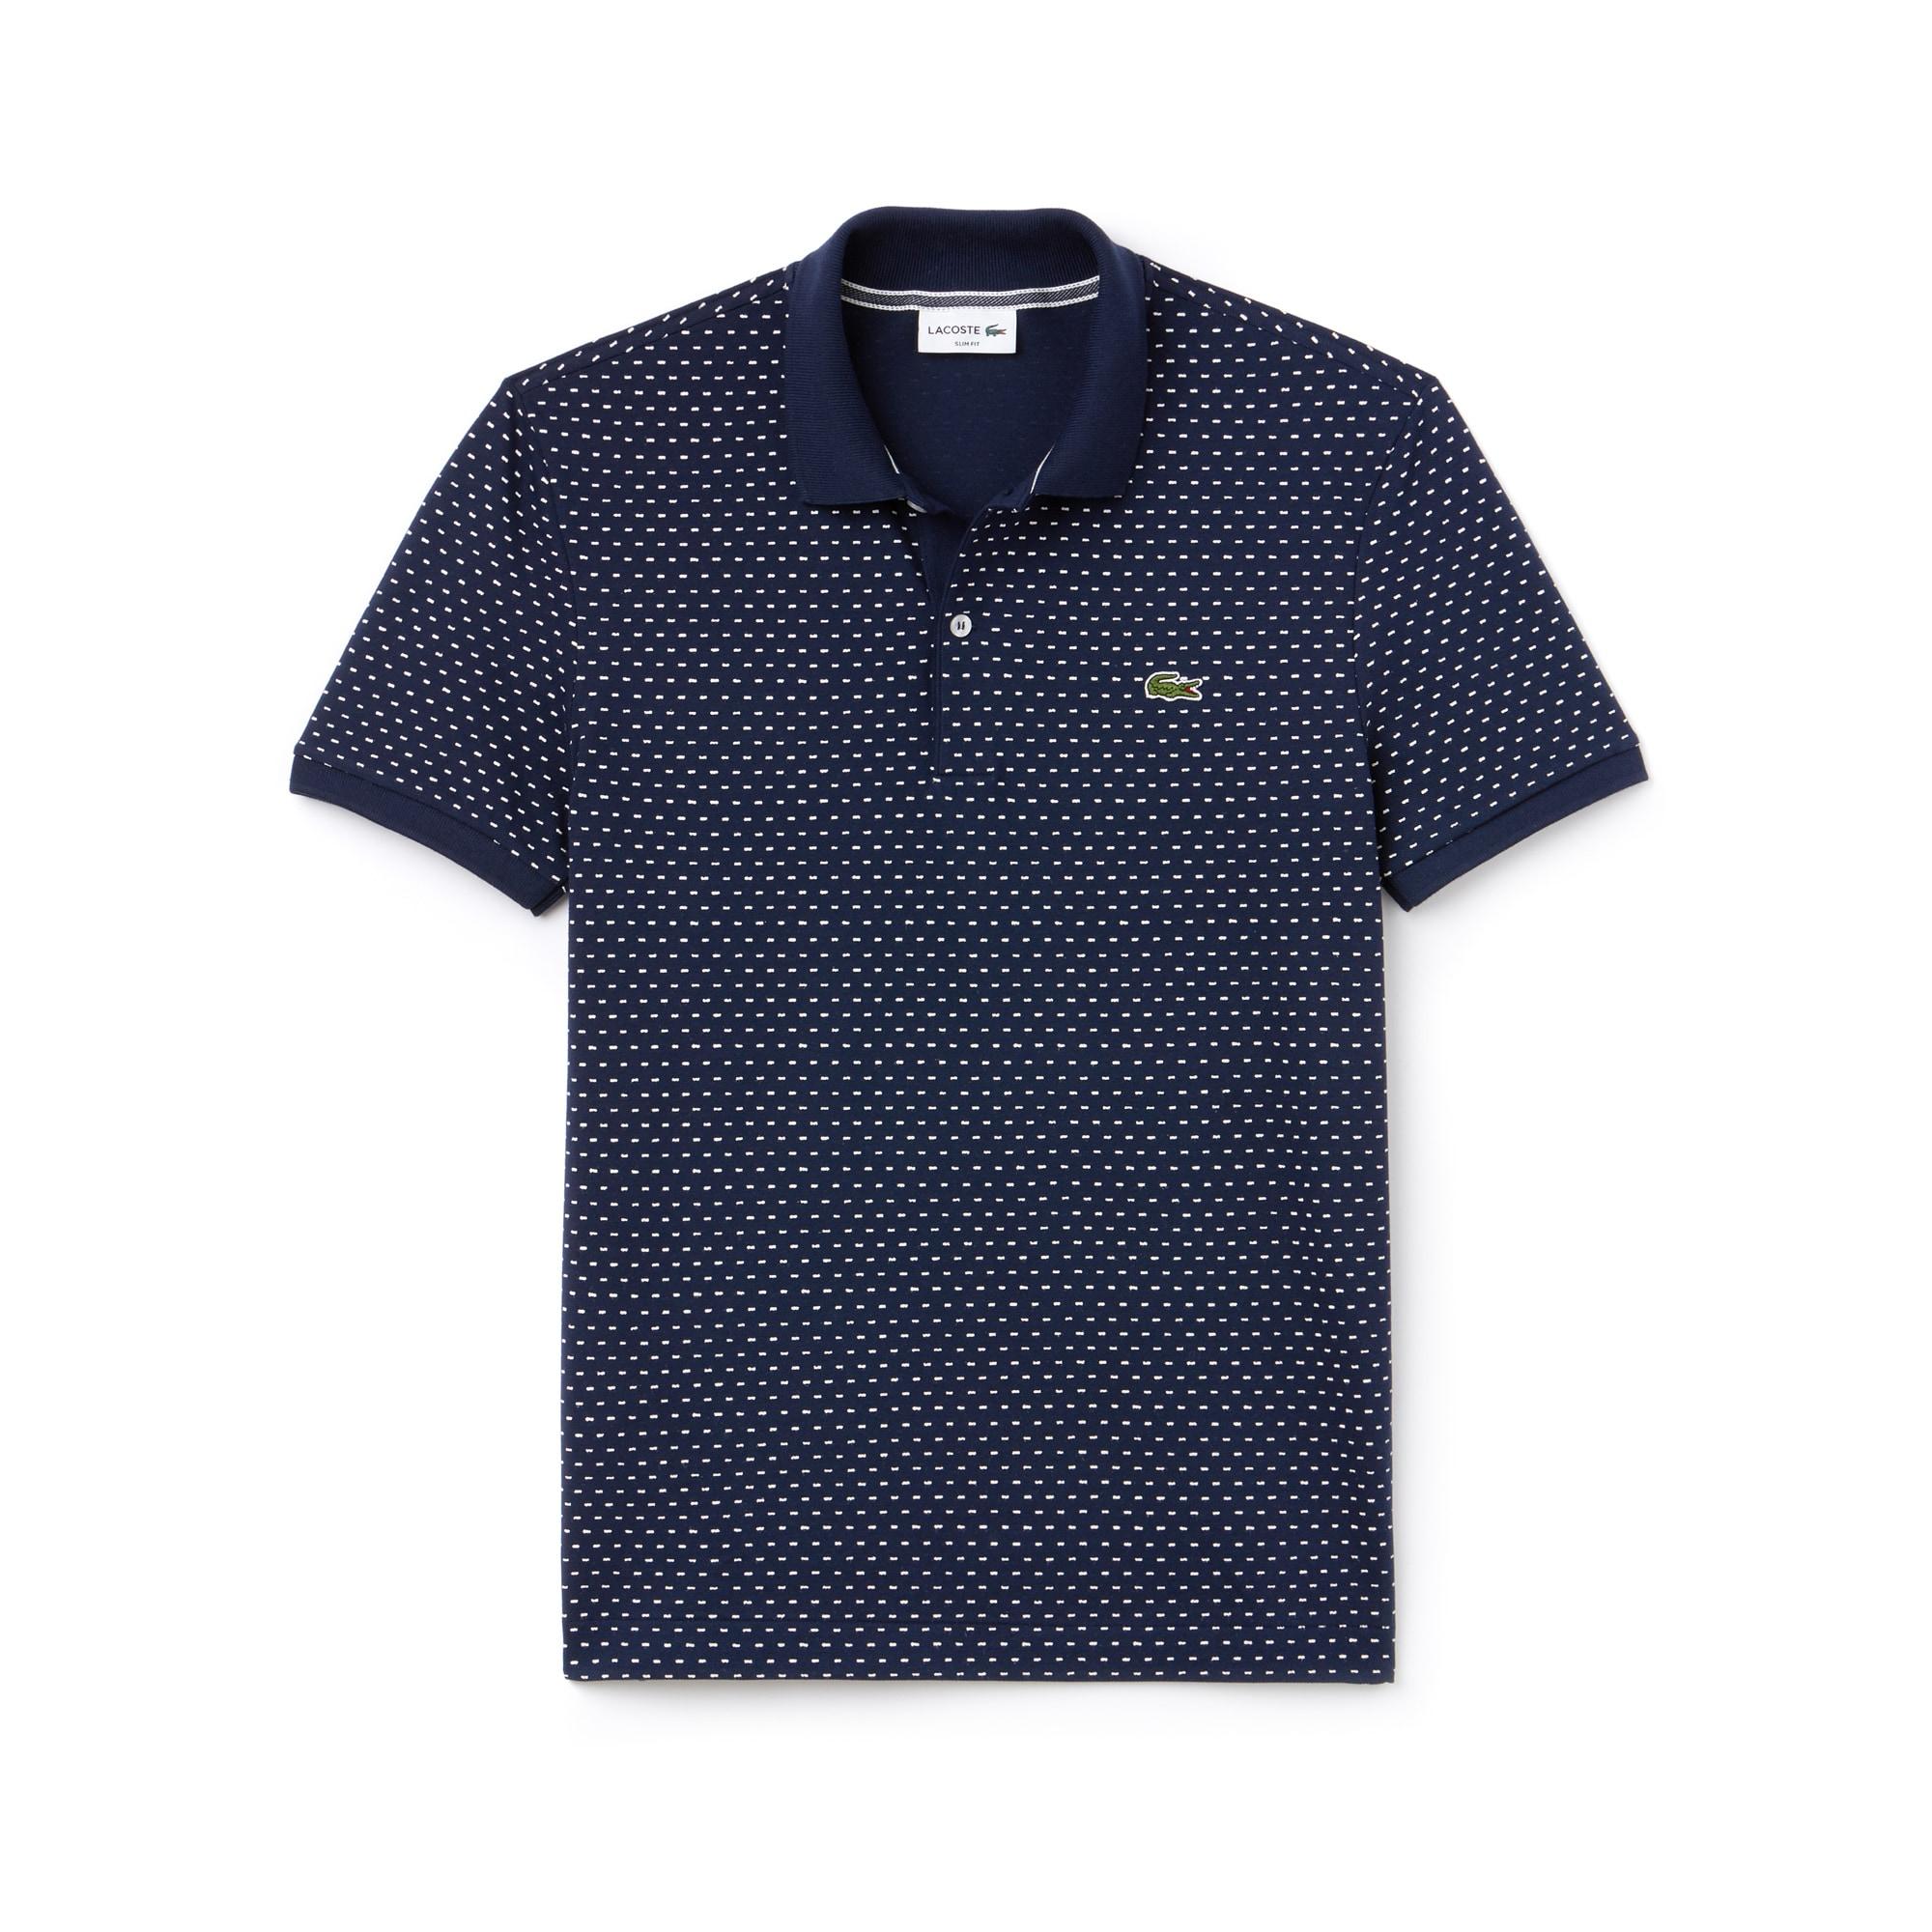 Lacoste男士修身版印花小凸纹网眼面料Polo衫